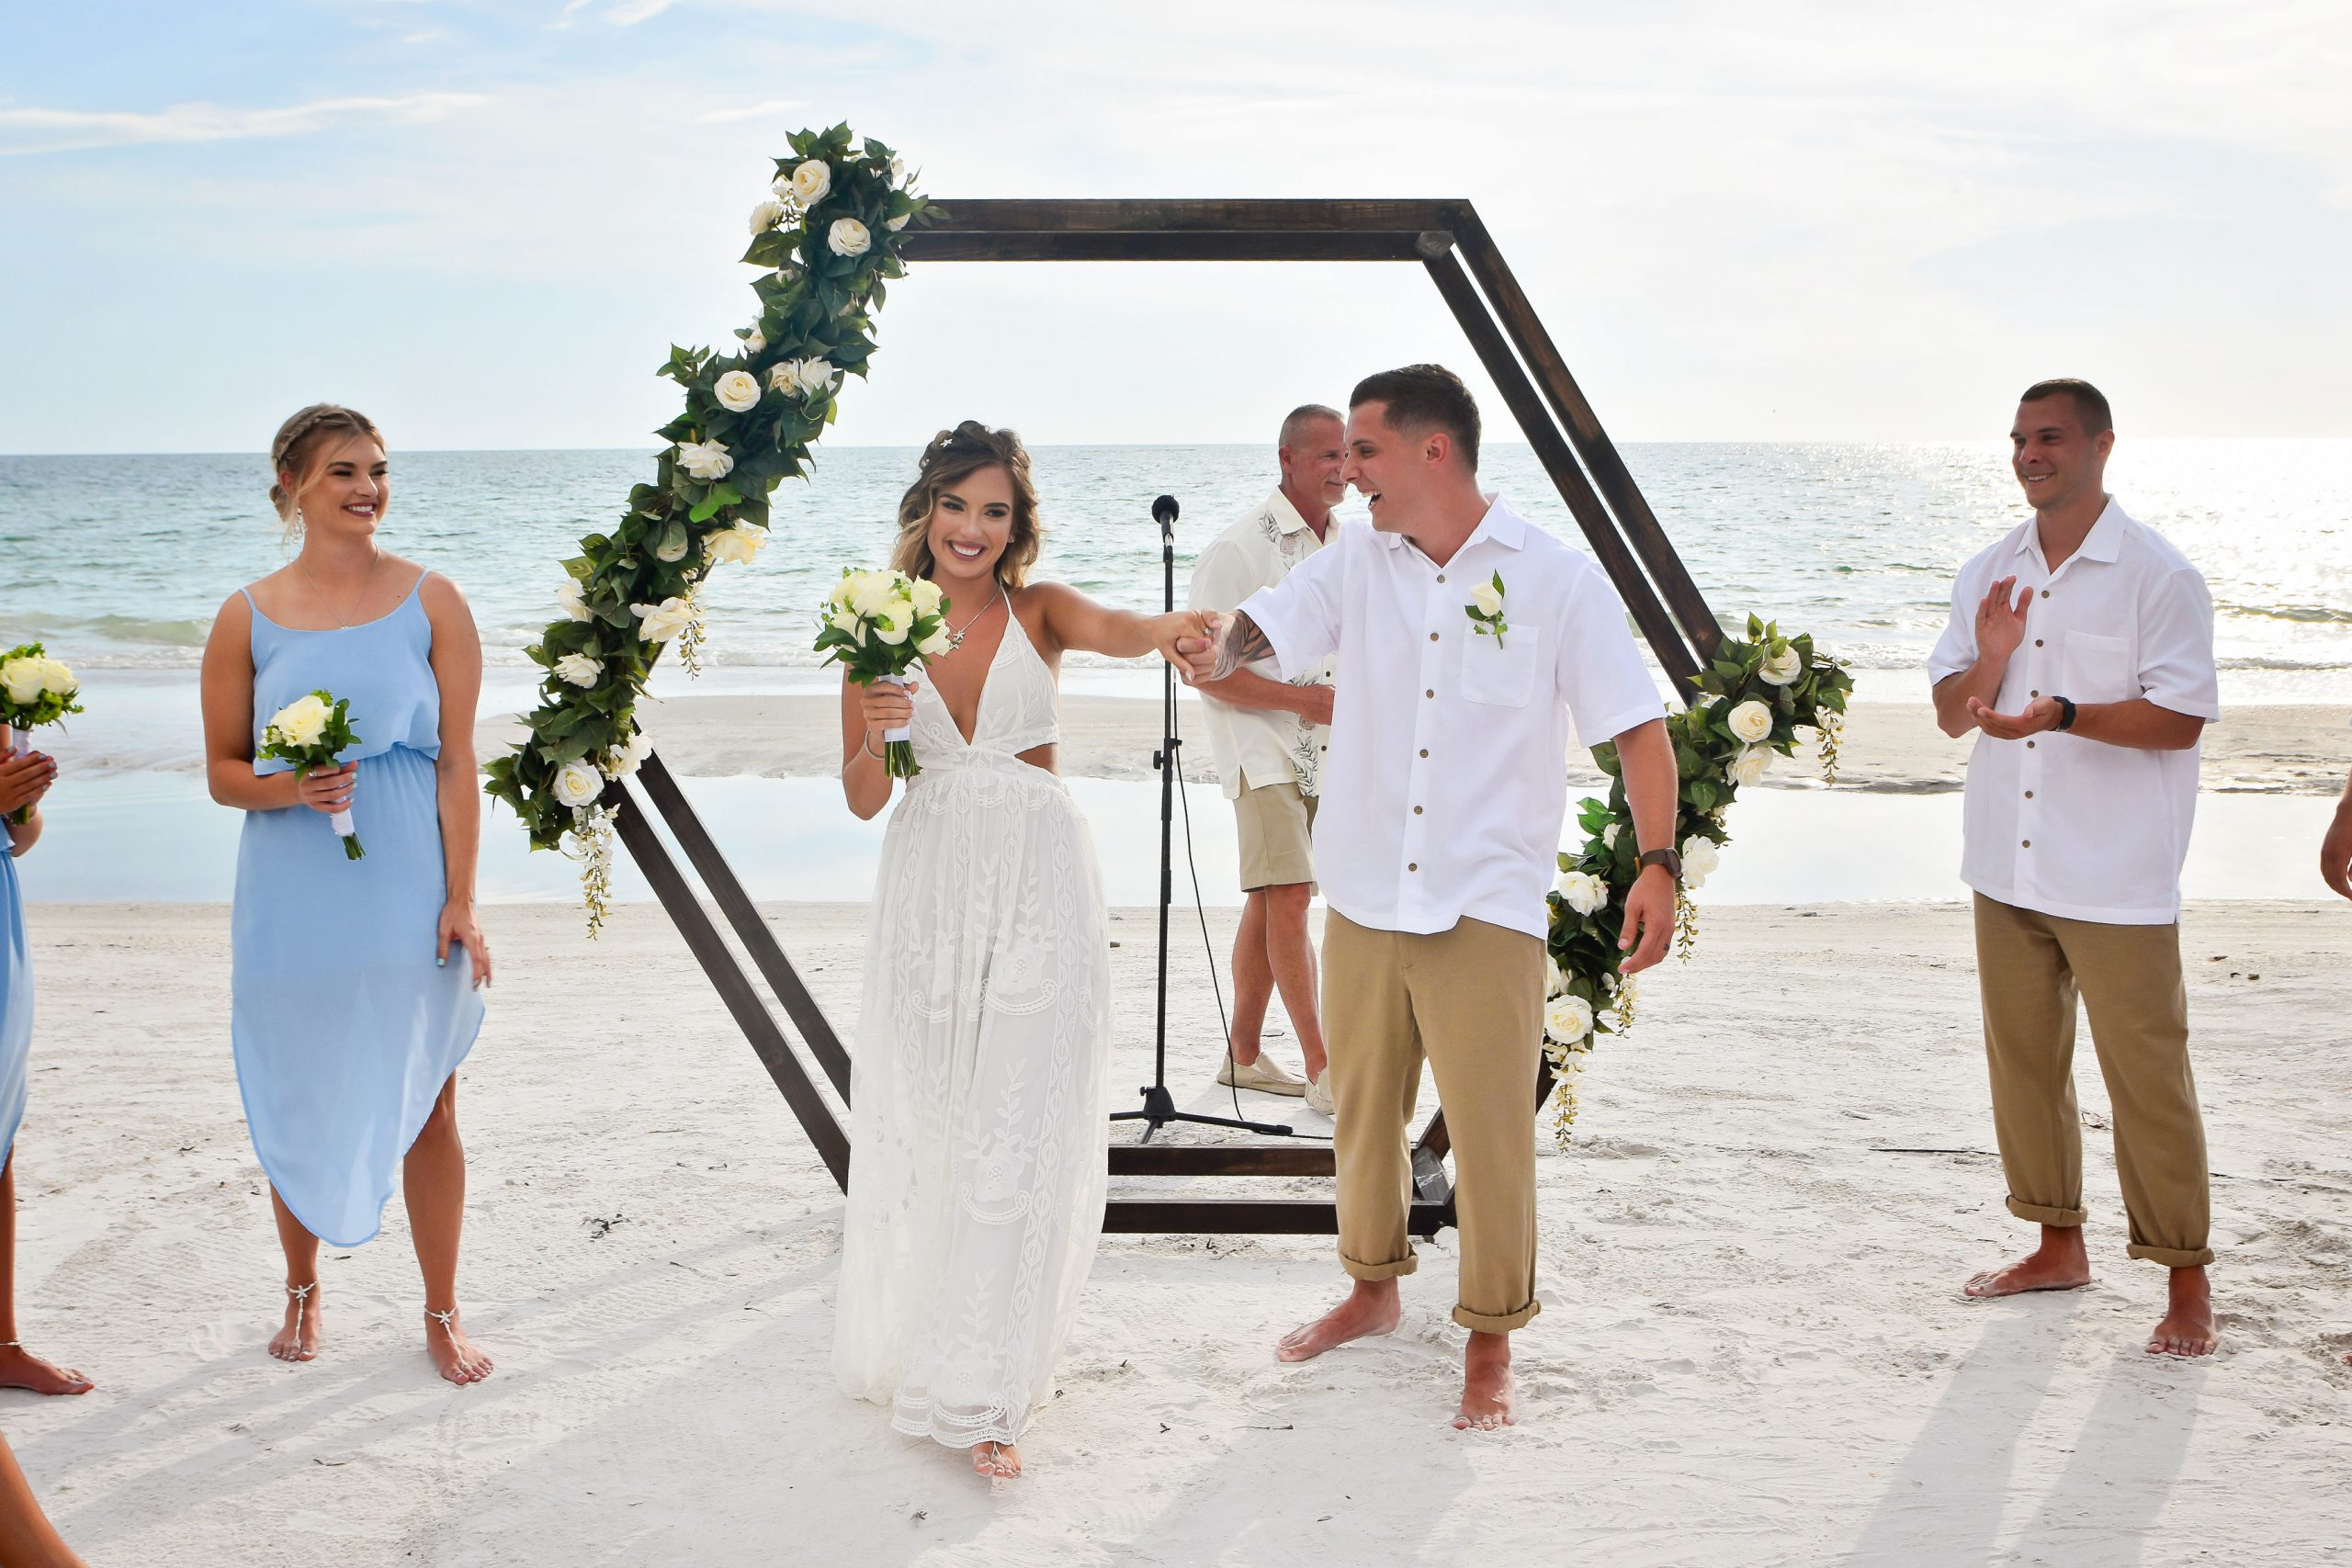 geometric rustic wooden wedding arch on the beach